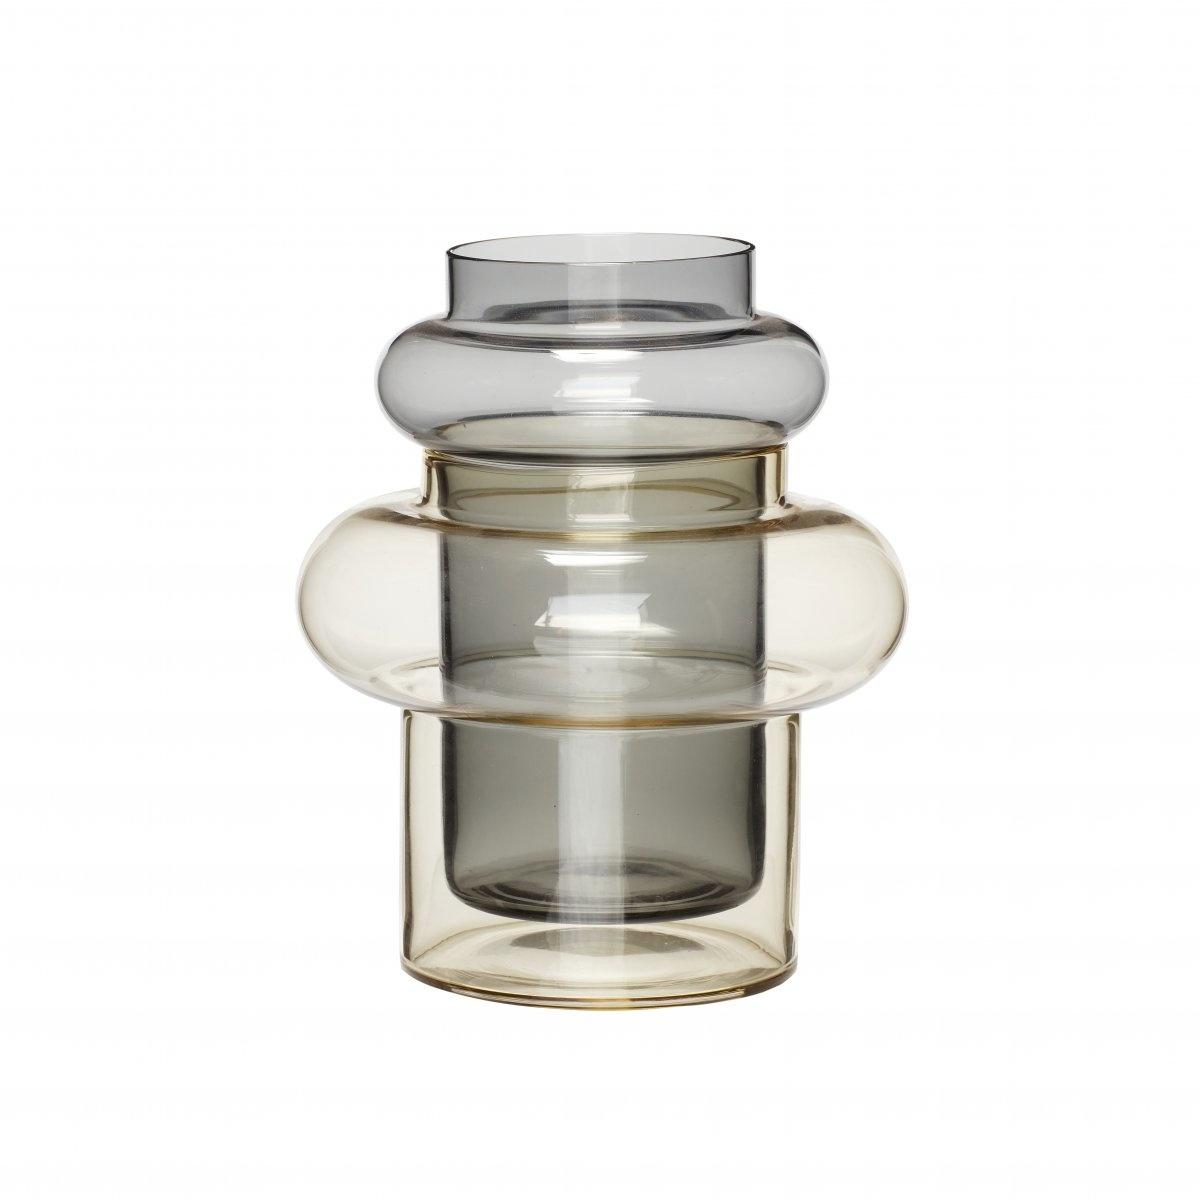 Hubsch Vaas, glas, geel / gerookt-950407-